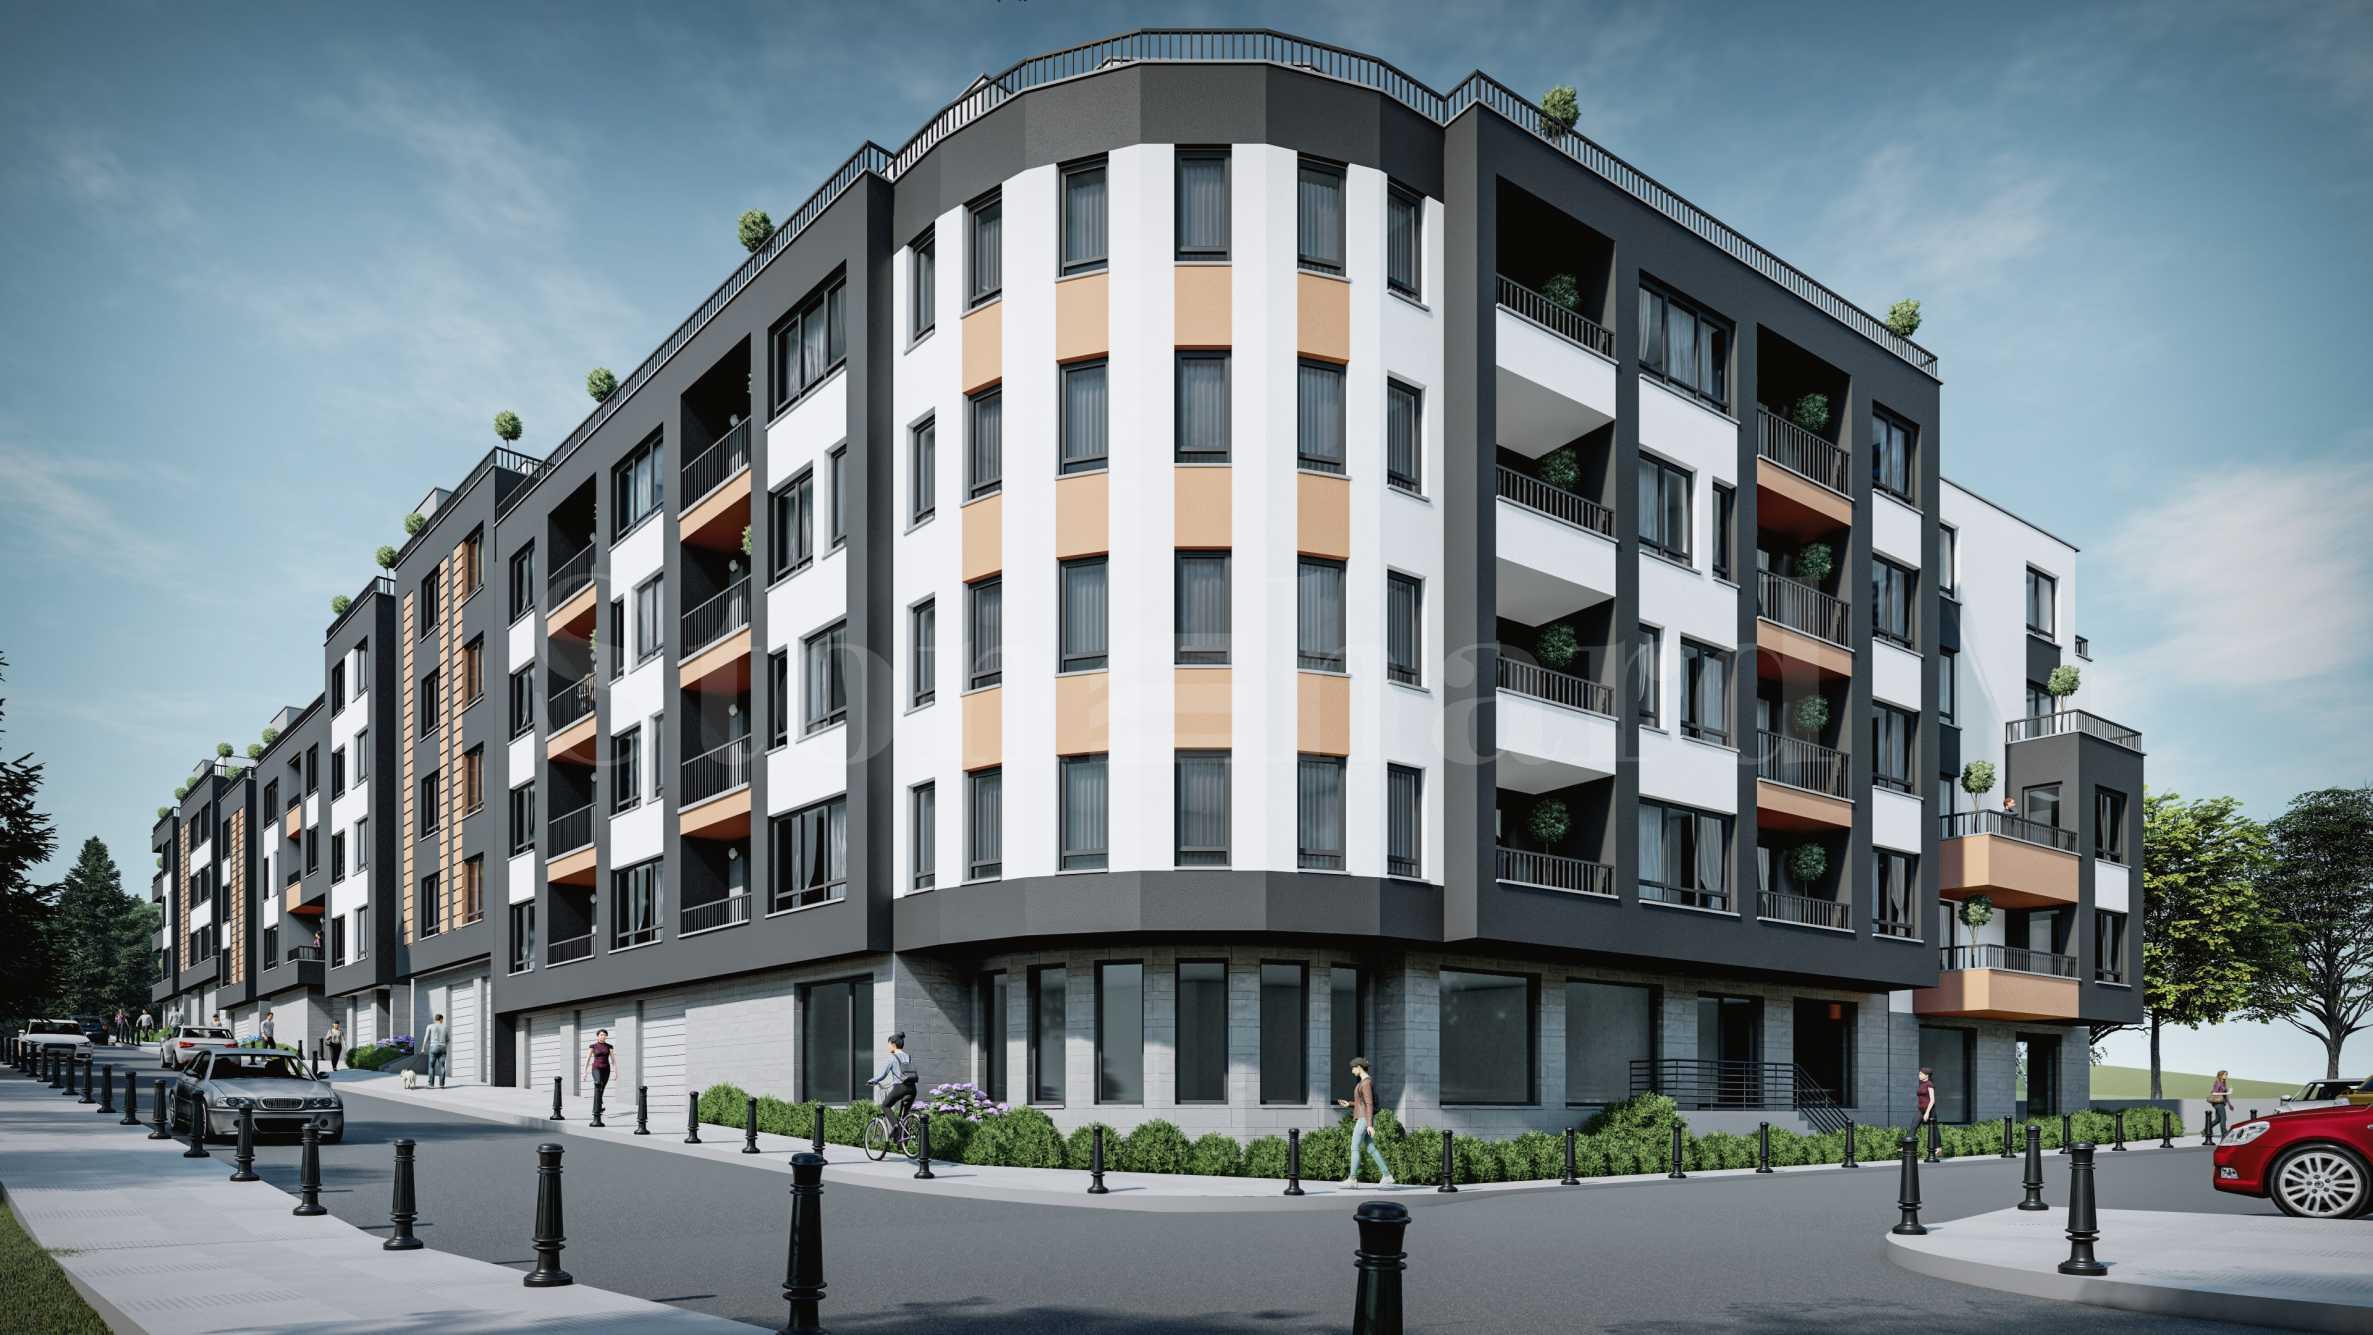 Атрактивни нови жилища в жилищна сграда в столичния кв. Дианабад1 - Stonehard